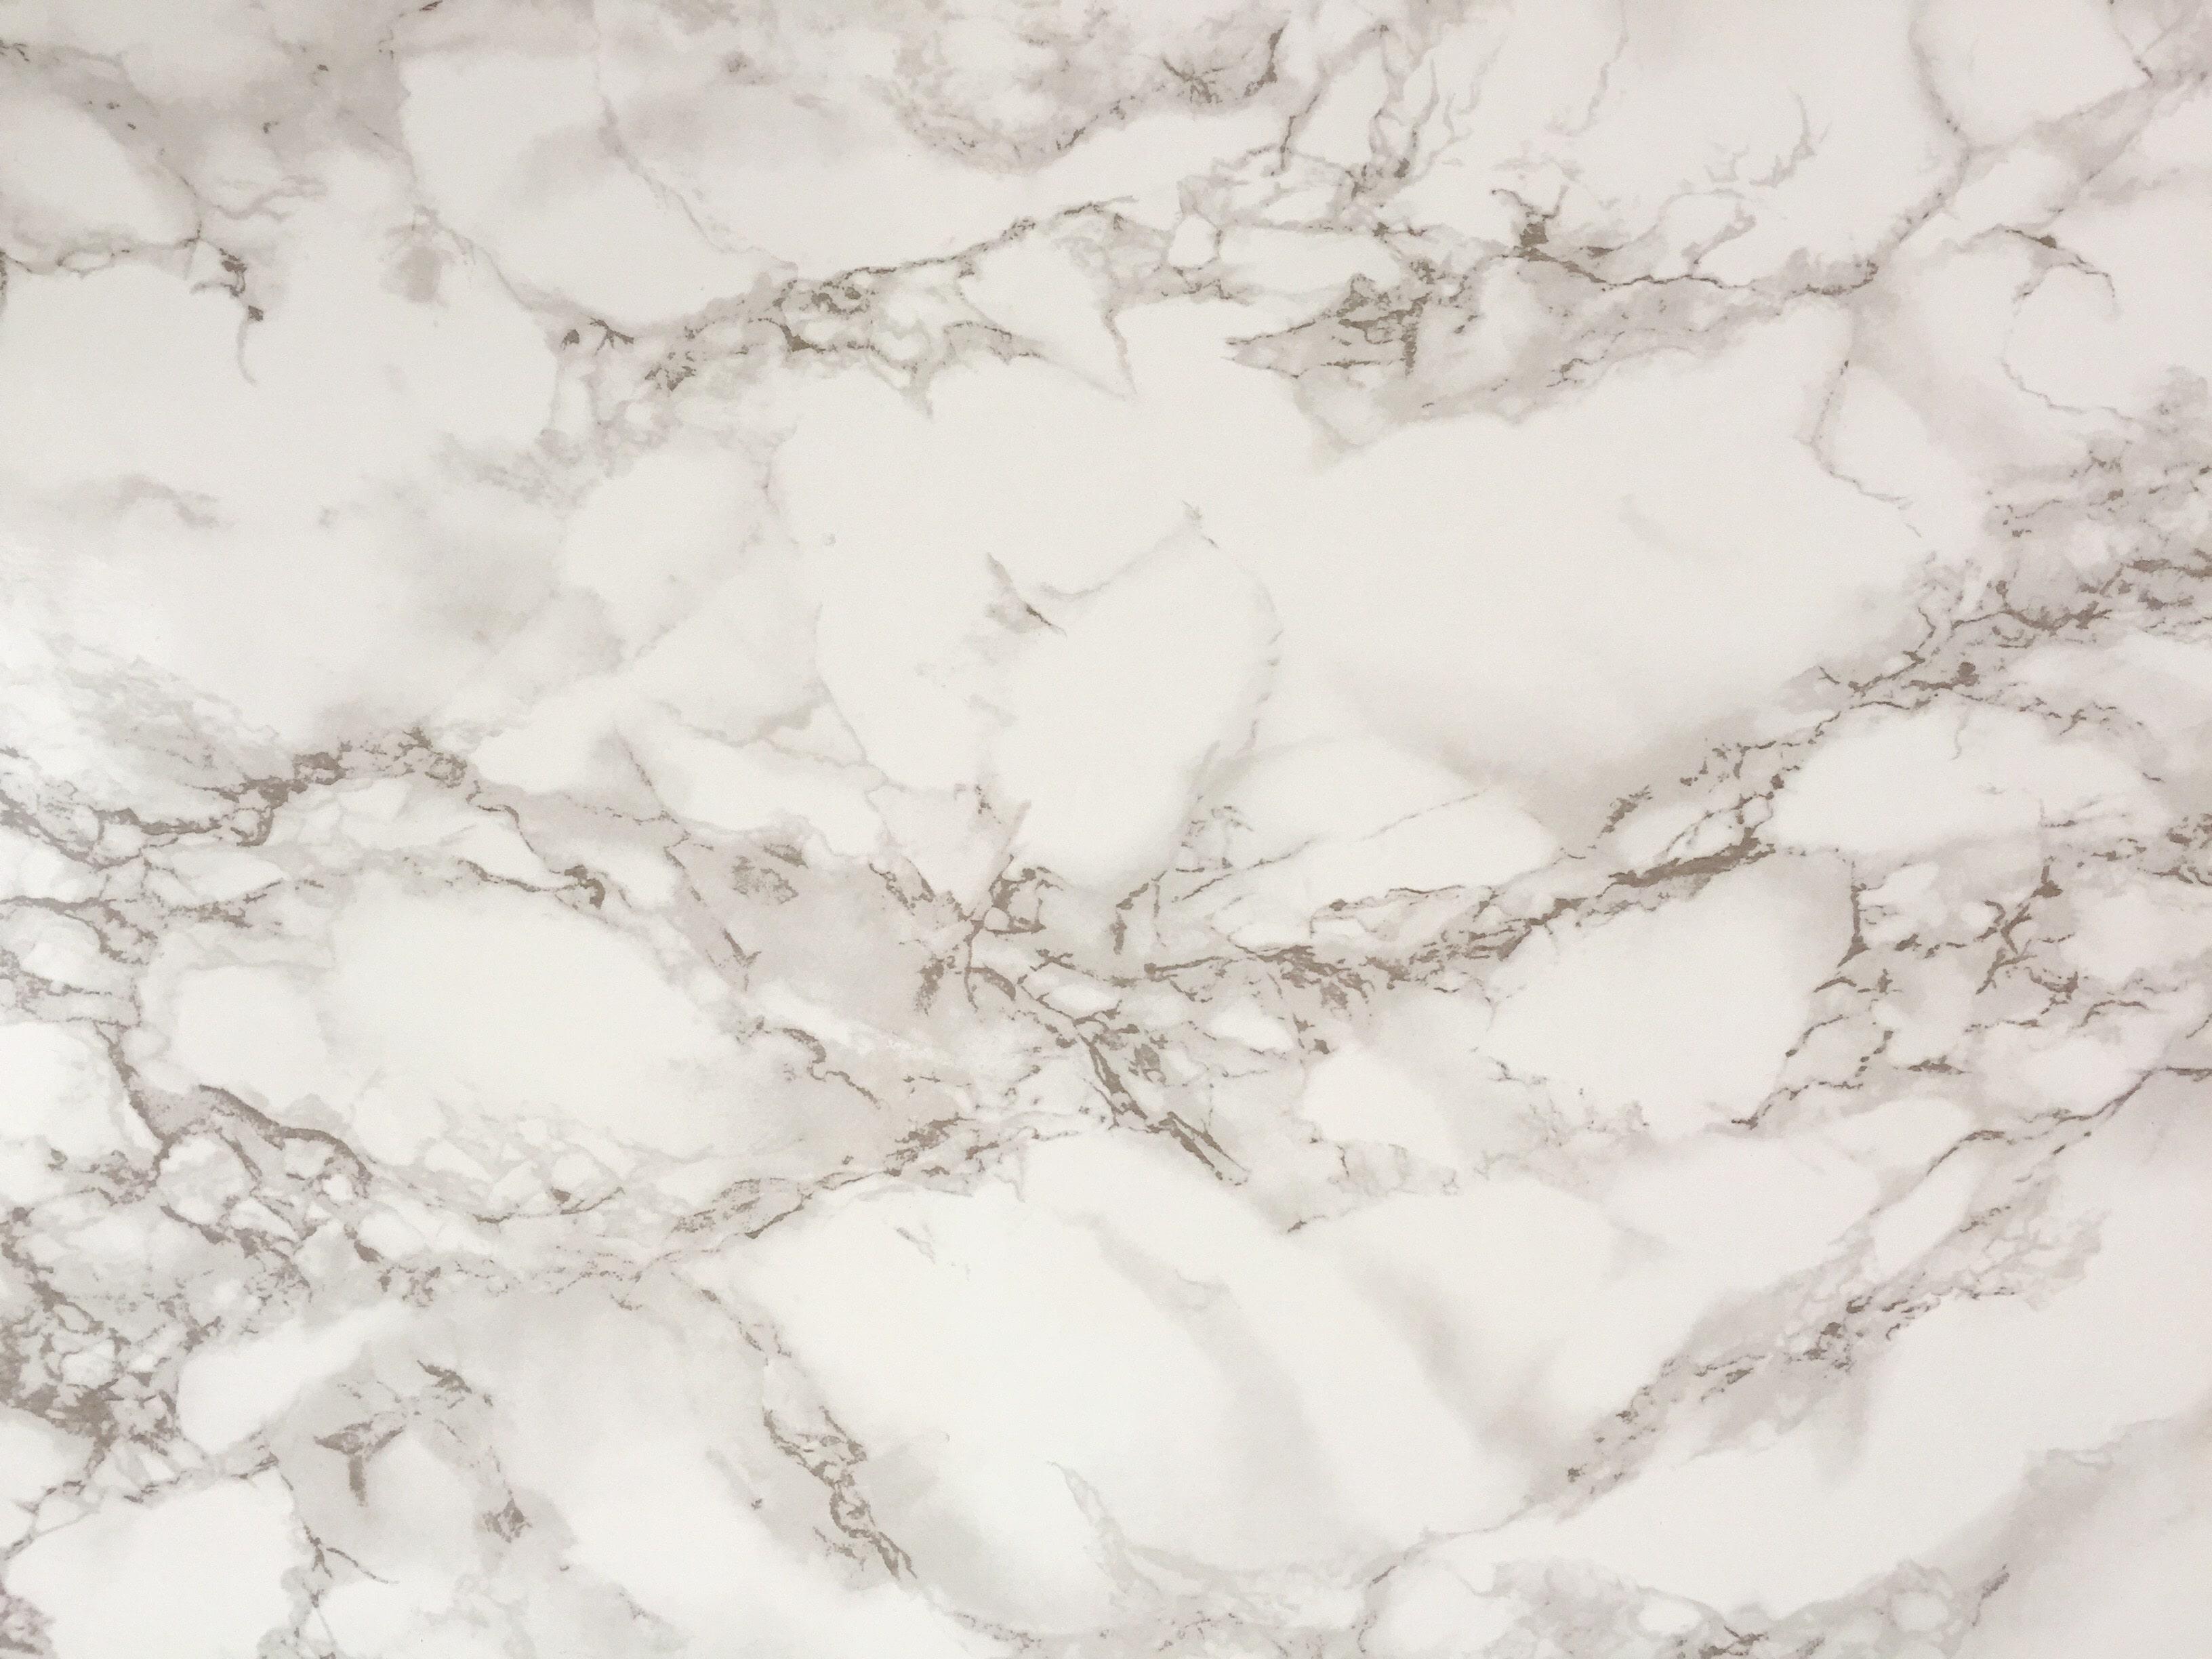 marble r novation de marbre pierre depuis 1971. Black Bedroom Furniture Sets. Home Design Ideas